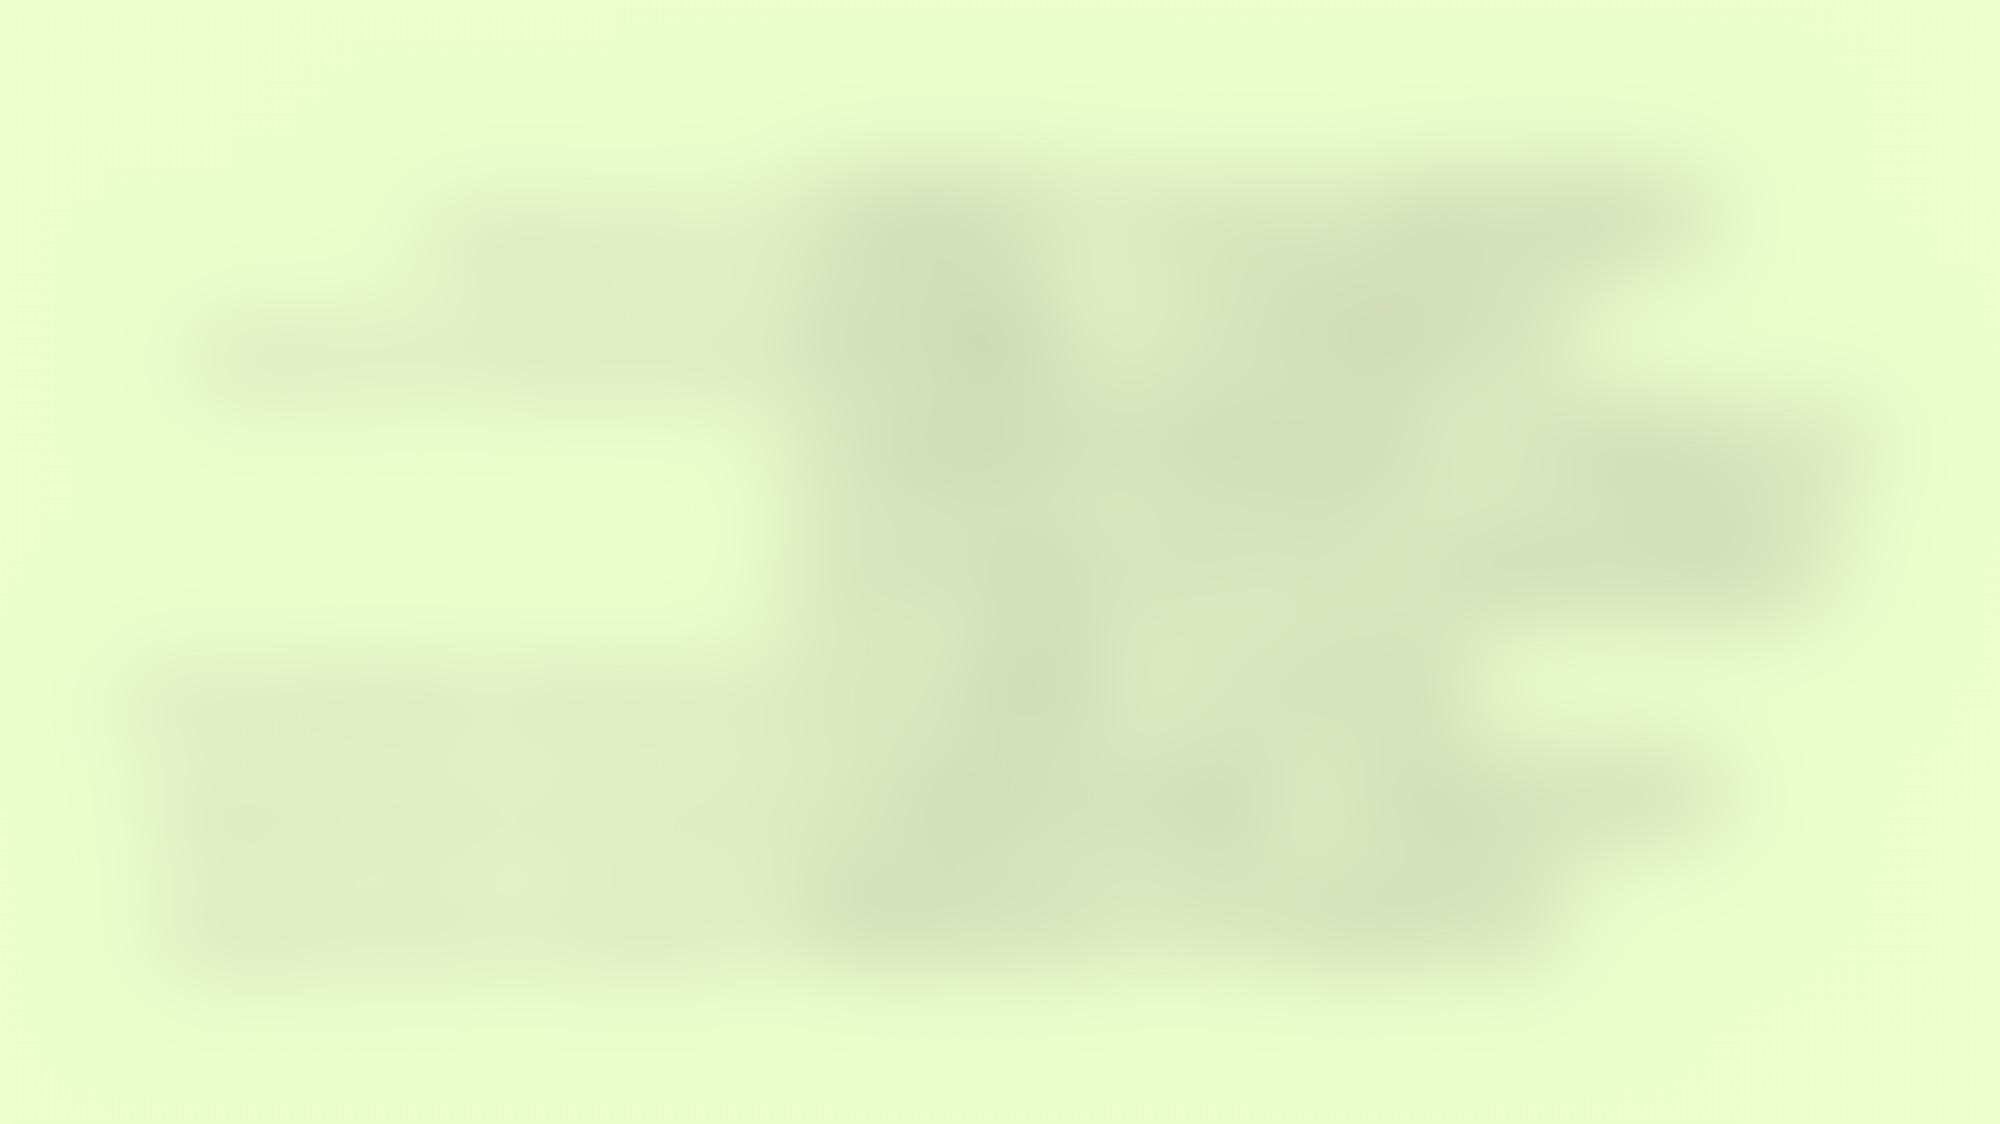 Simonsw2 autocompressfitresizeixlibphp 1 1 0max h2000max w3 D2000q80s3c472bcd43002d53e1dffaa1ea592aaf